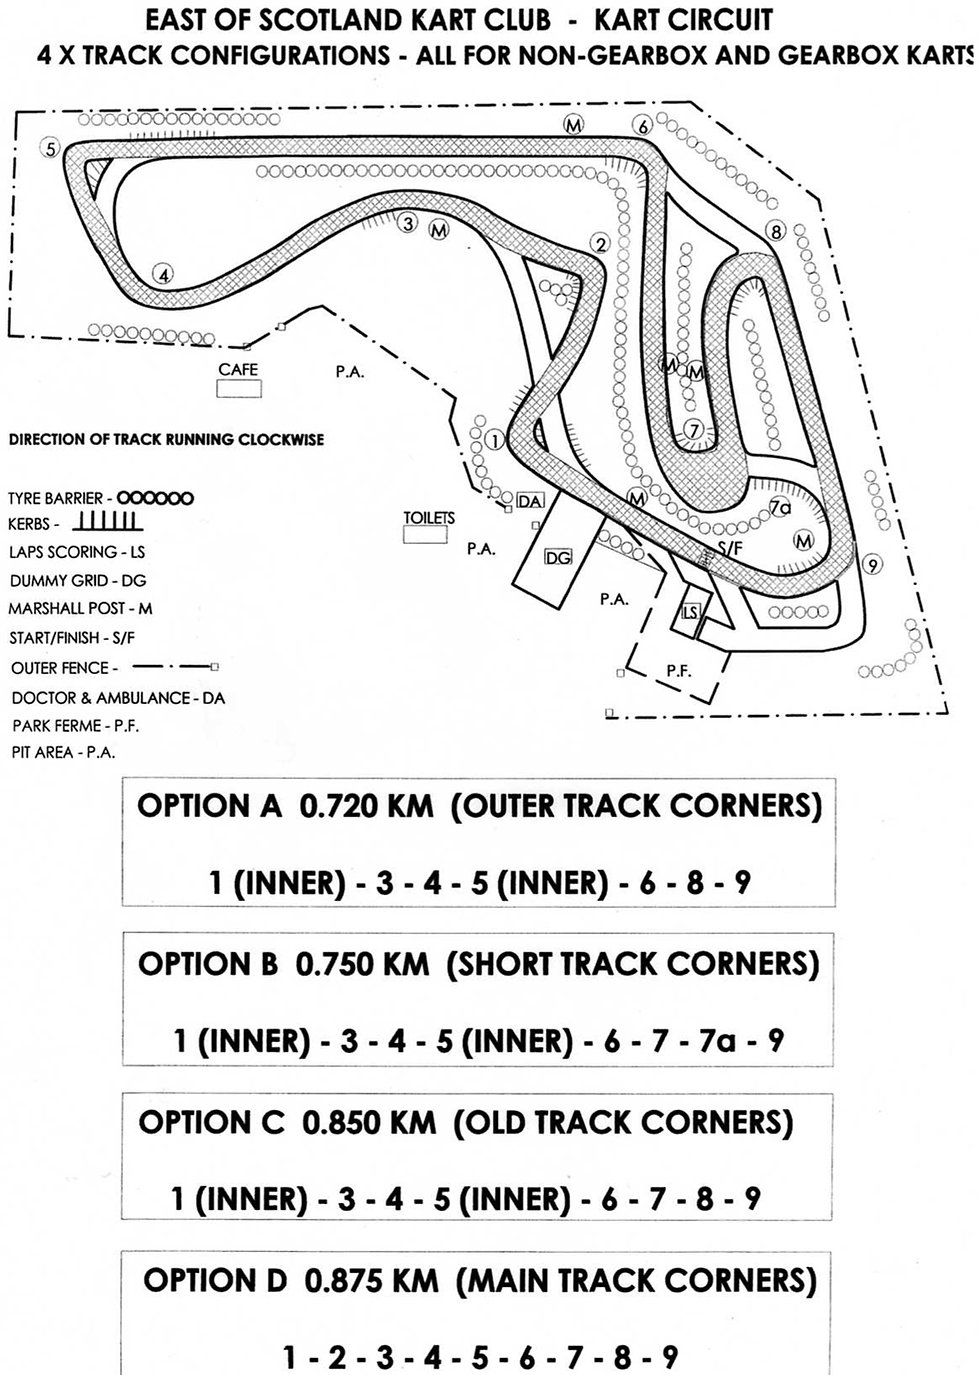 Track Layouts.jpg